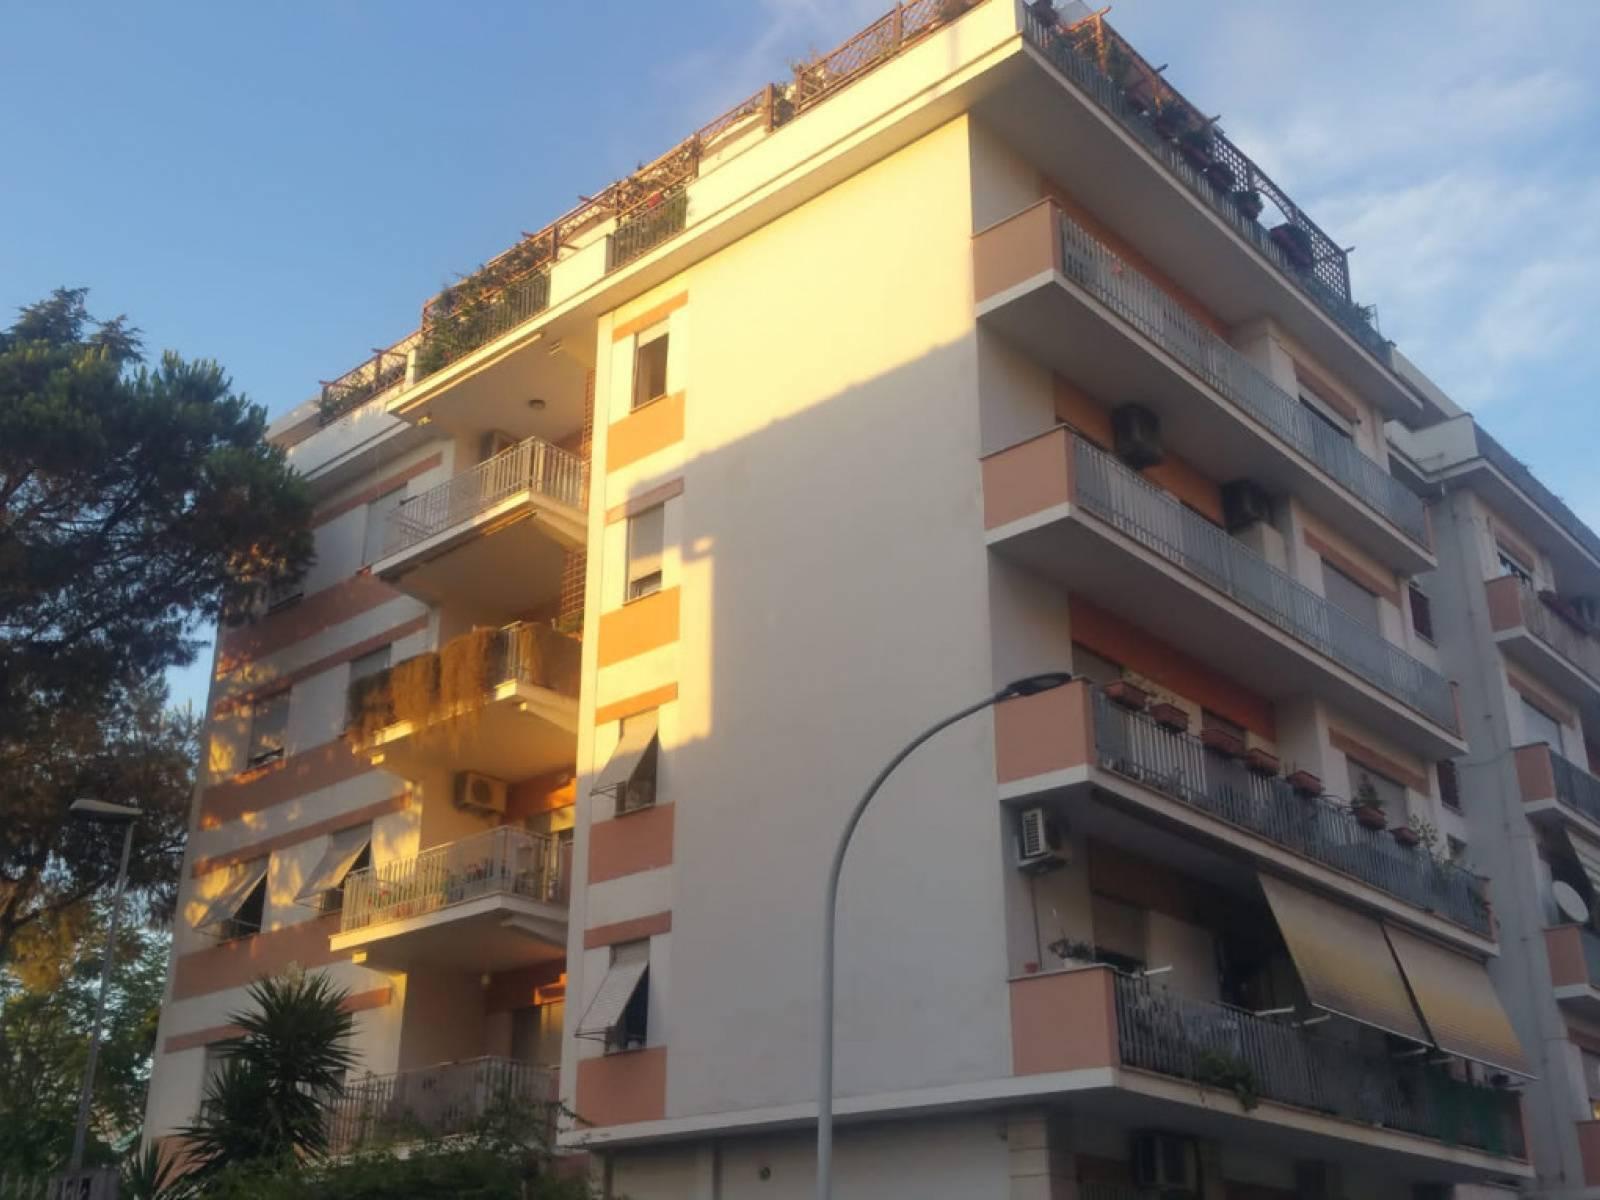 1118419137 Bilocale in Via Giuseppe Palombini, Roma, Zona Baldo Degli Ubaldi